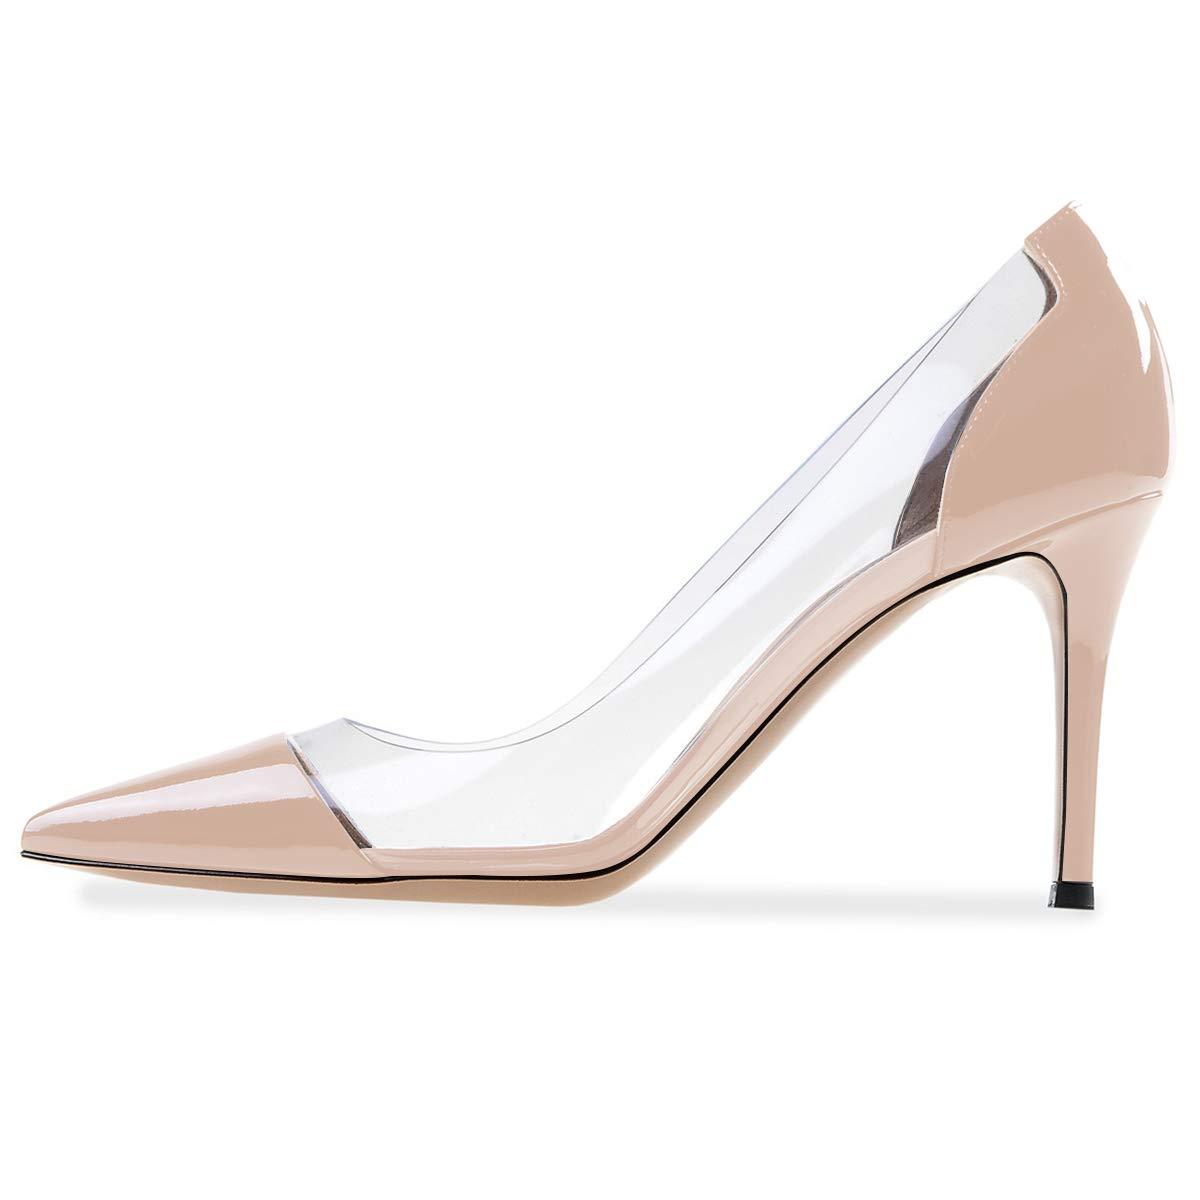 0da0d1bbfdc29 Sammitop Women's 80mm Pointed Toe Transparent Pumps Clear PVC High Heels  Dress Shoes